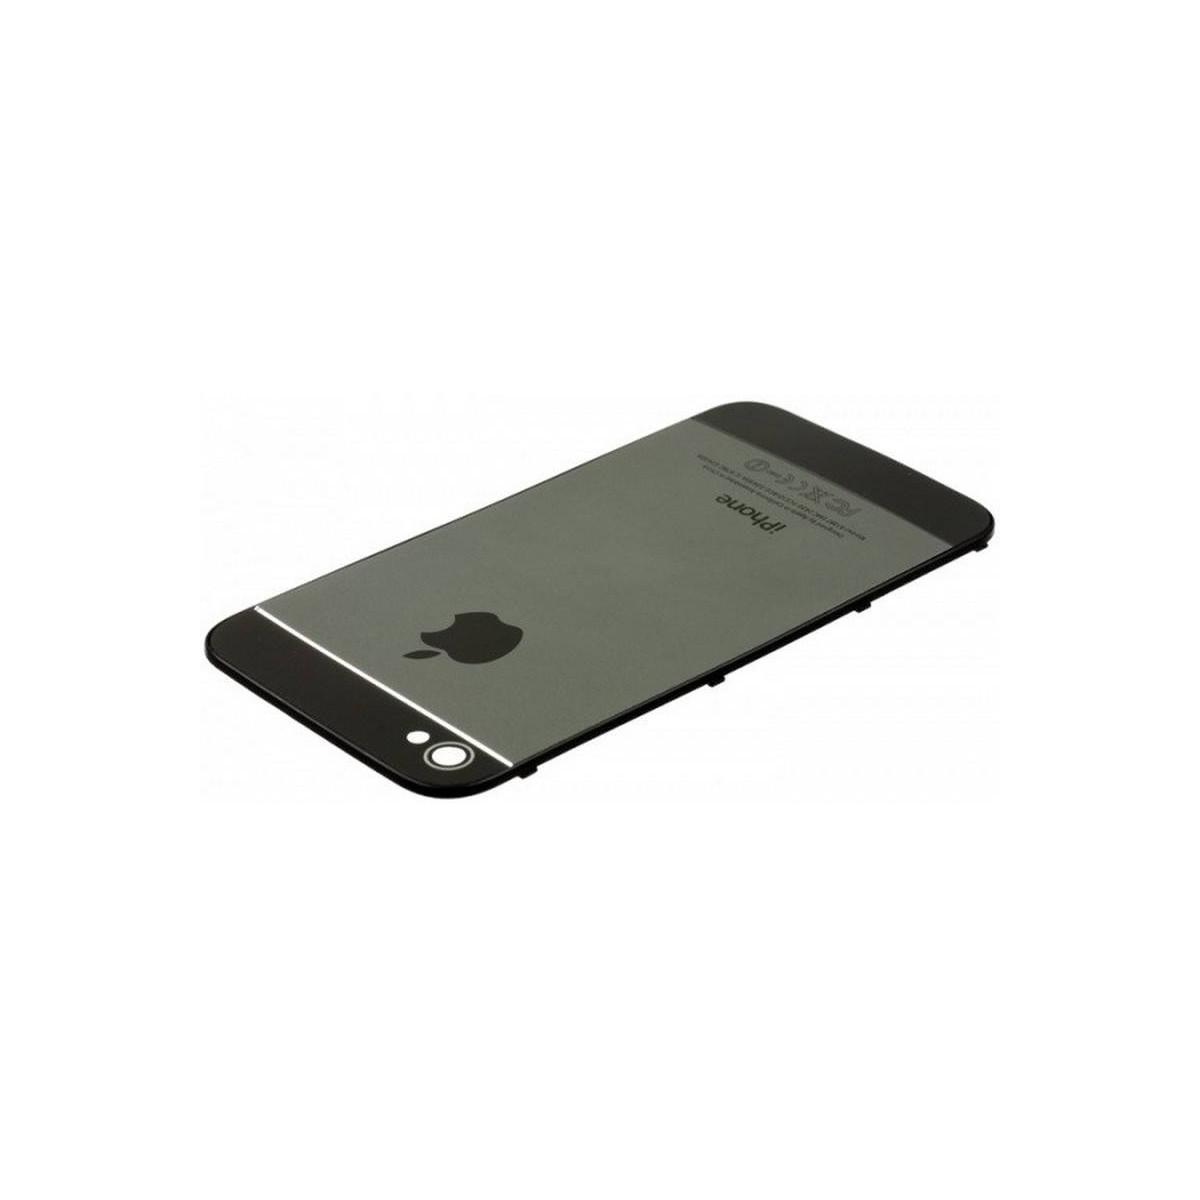 Tapa traseira bateria iPhone 4S (Imitacion iPhone 5) preta